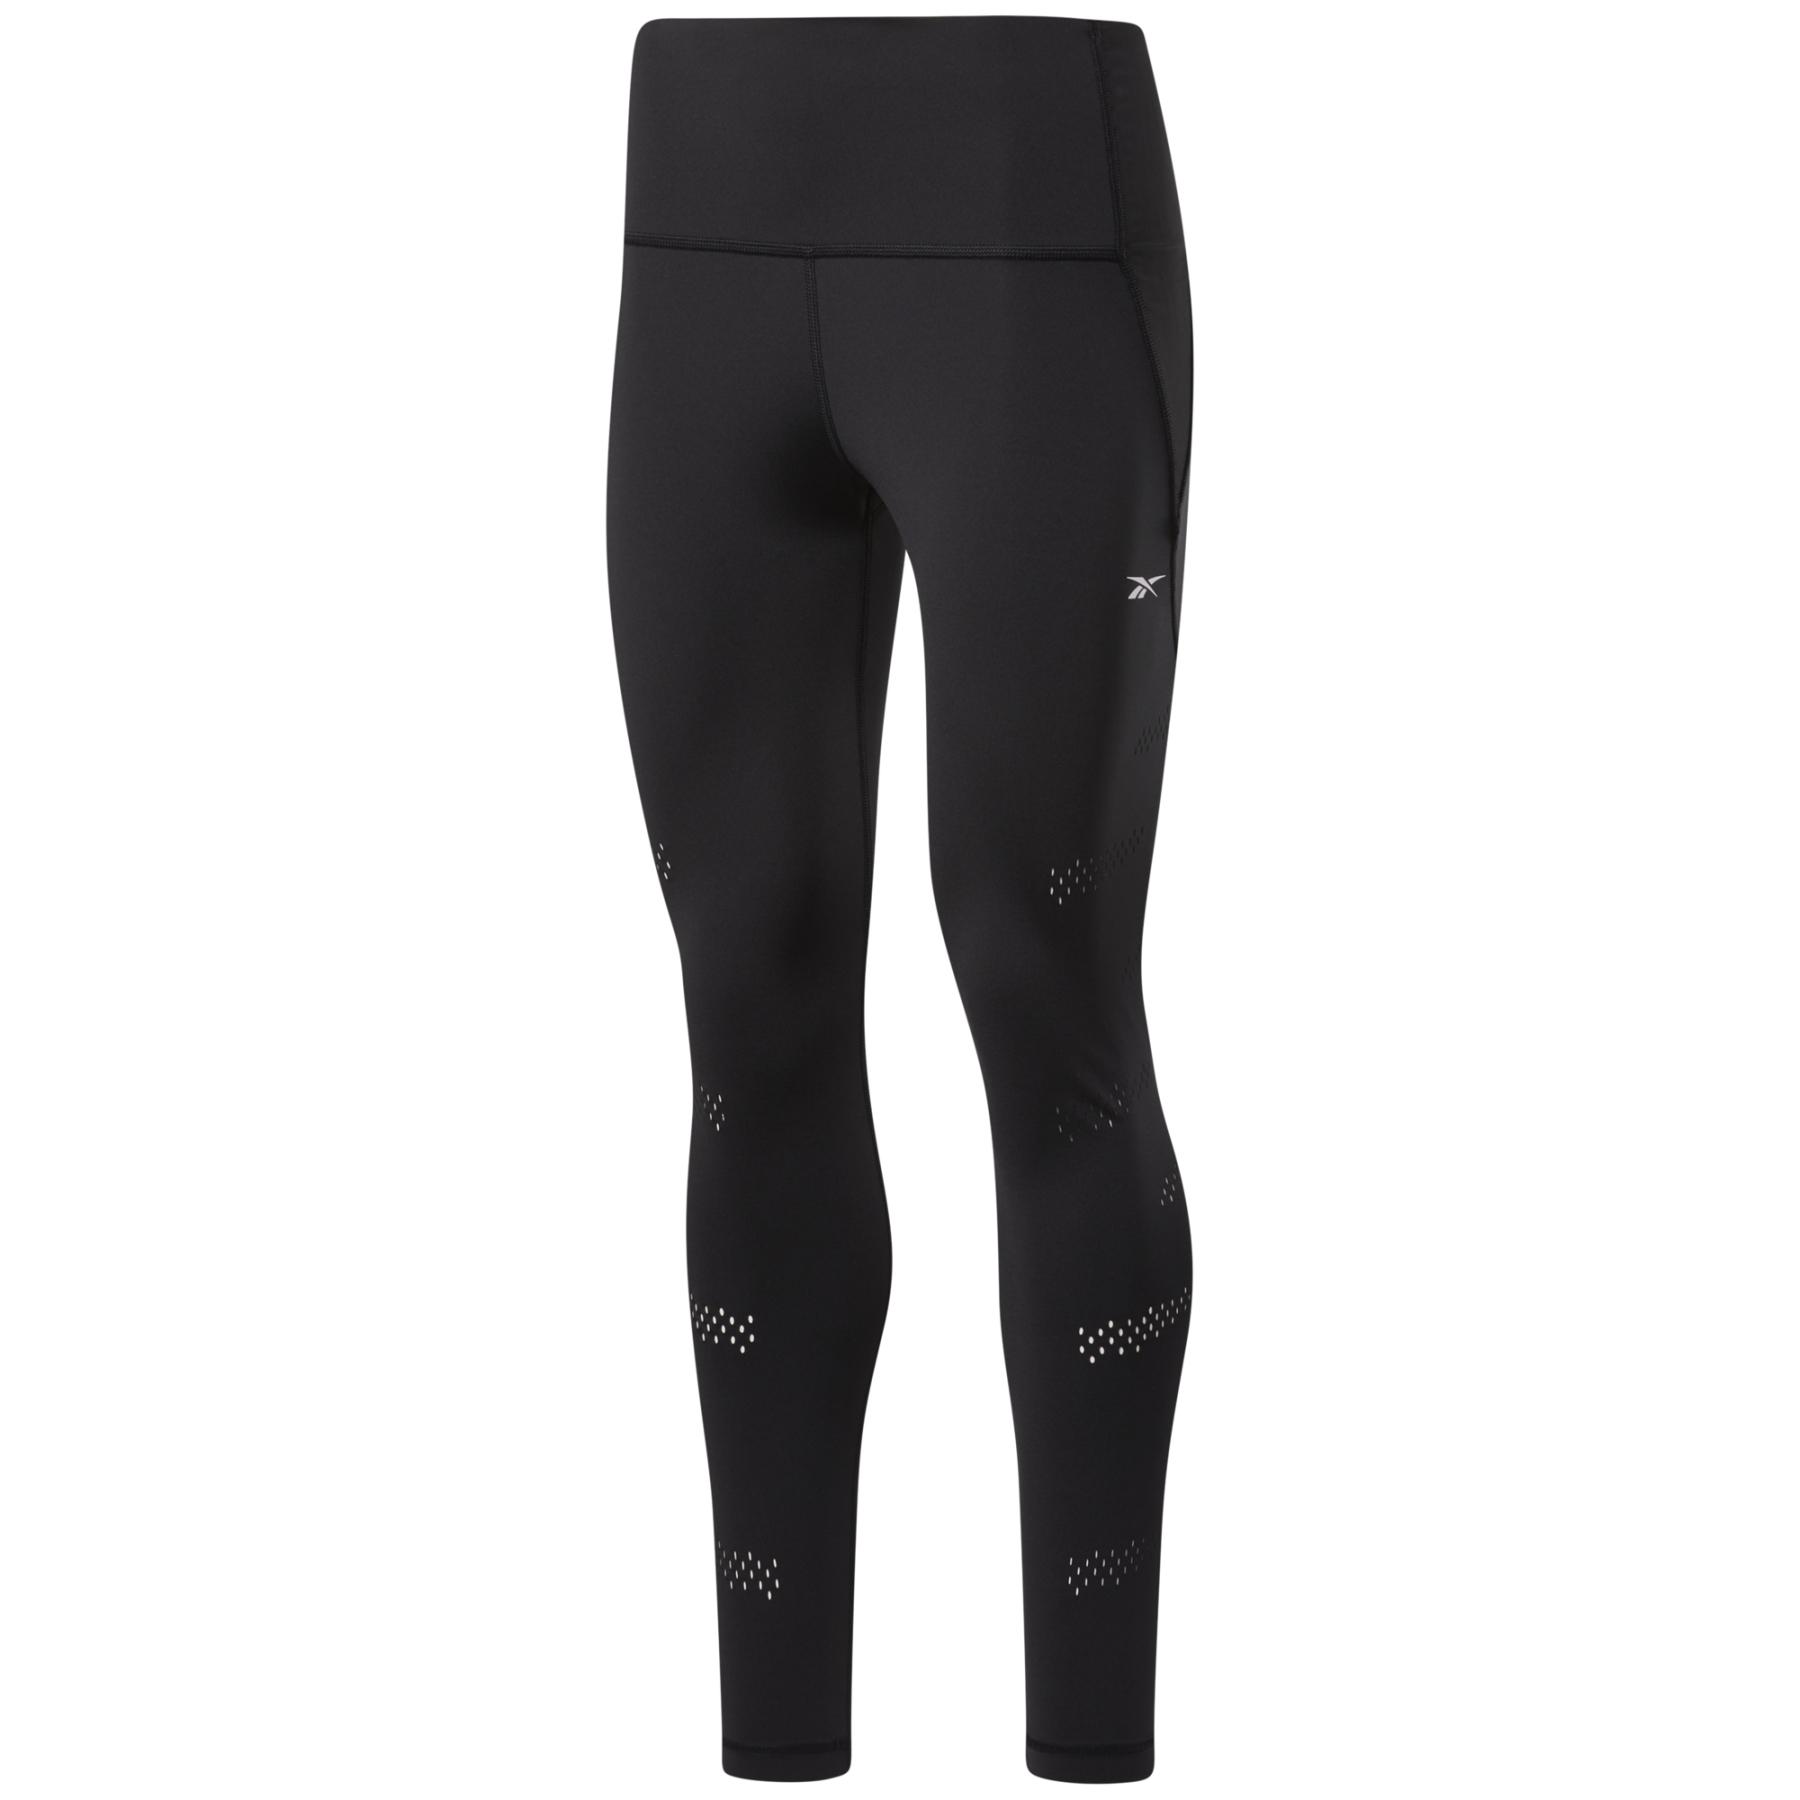 Reebok High-Rise Lux Perform Perforated Damen-Leggings - black GL2621